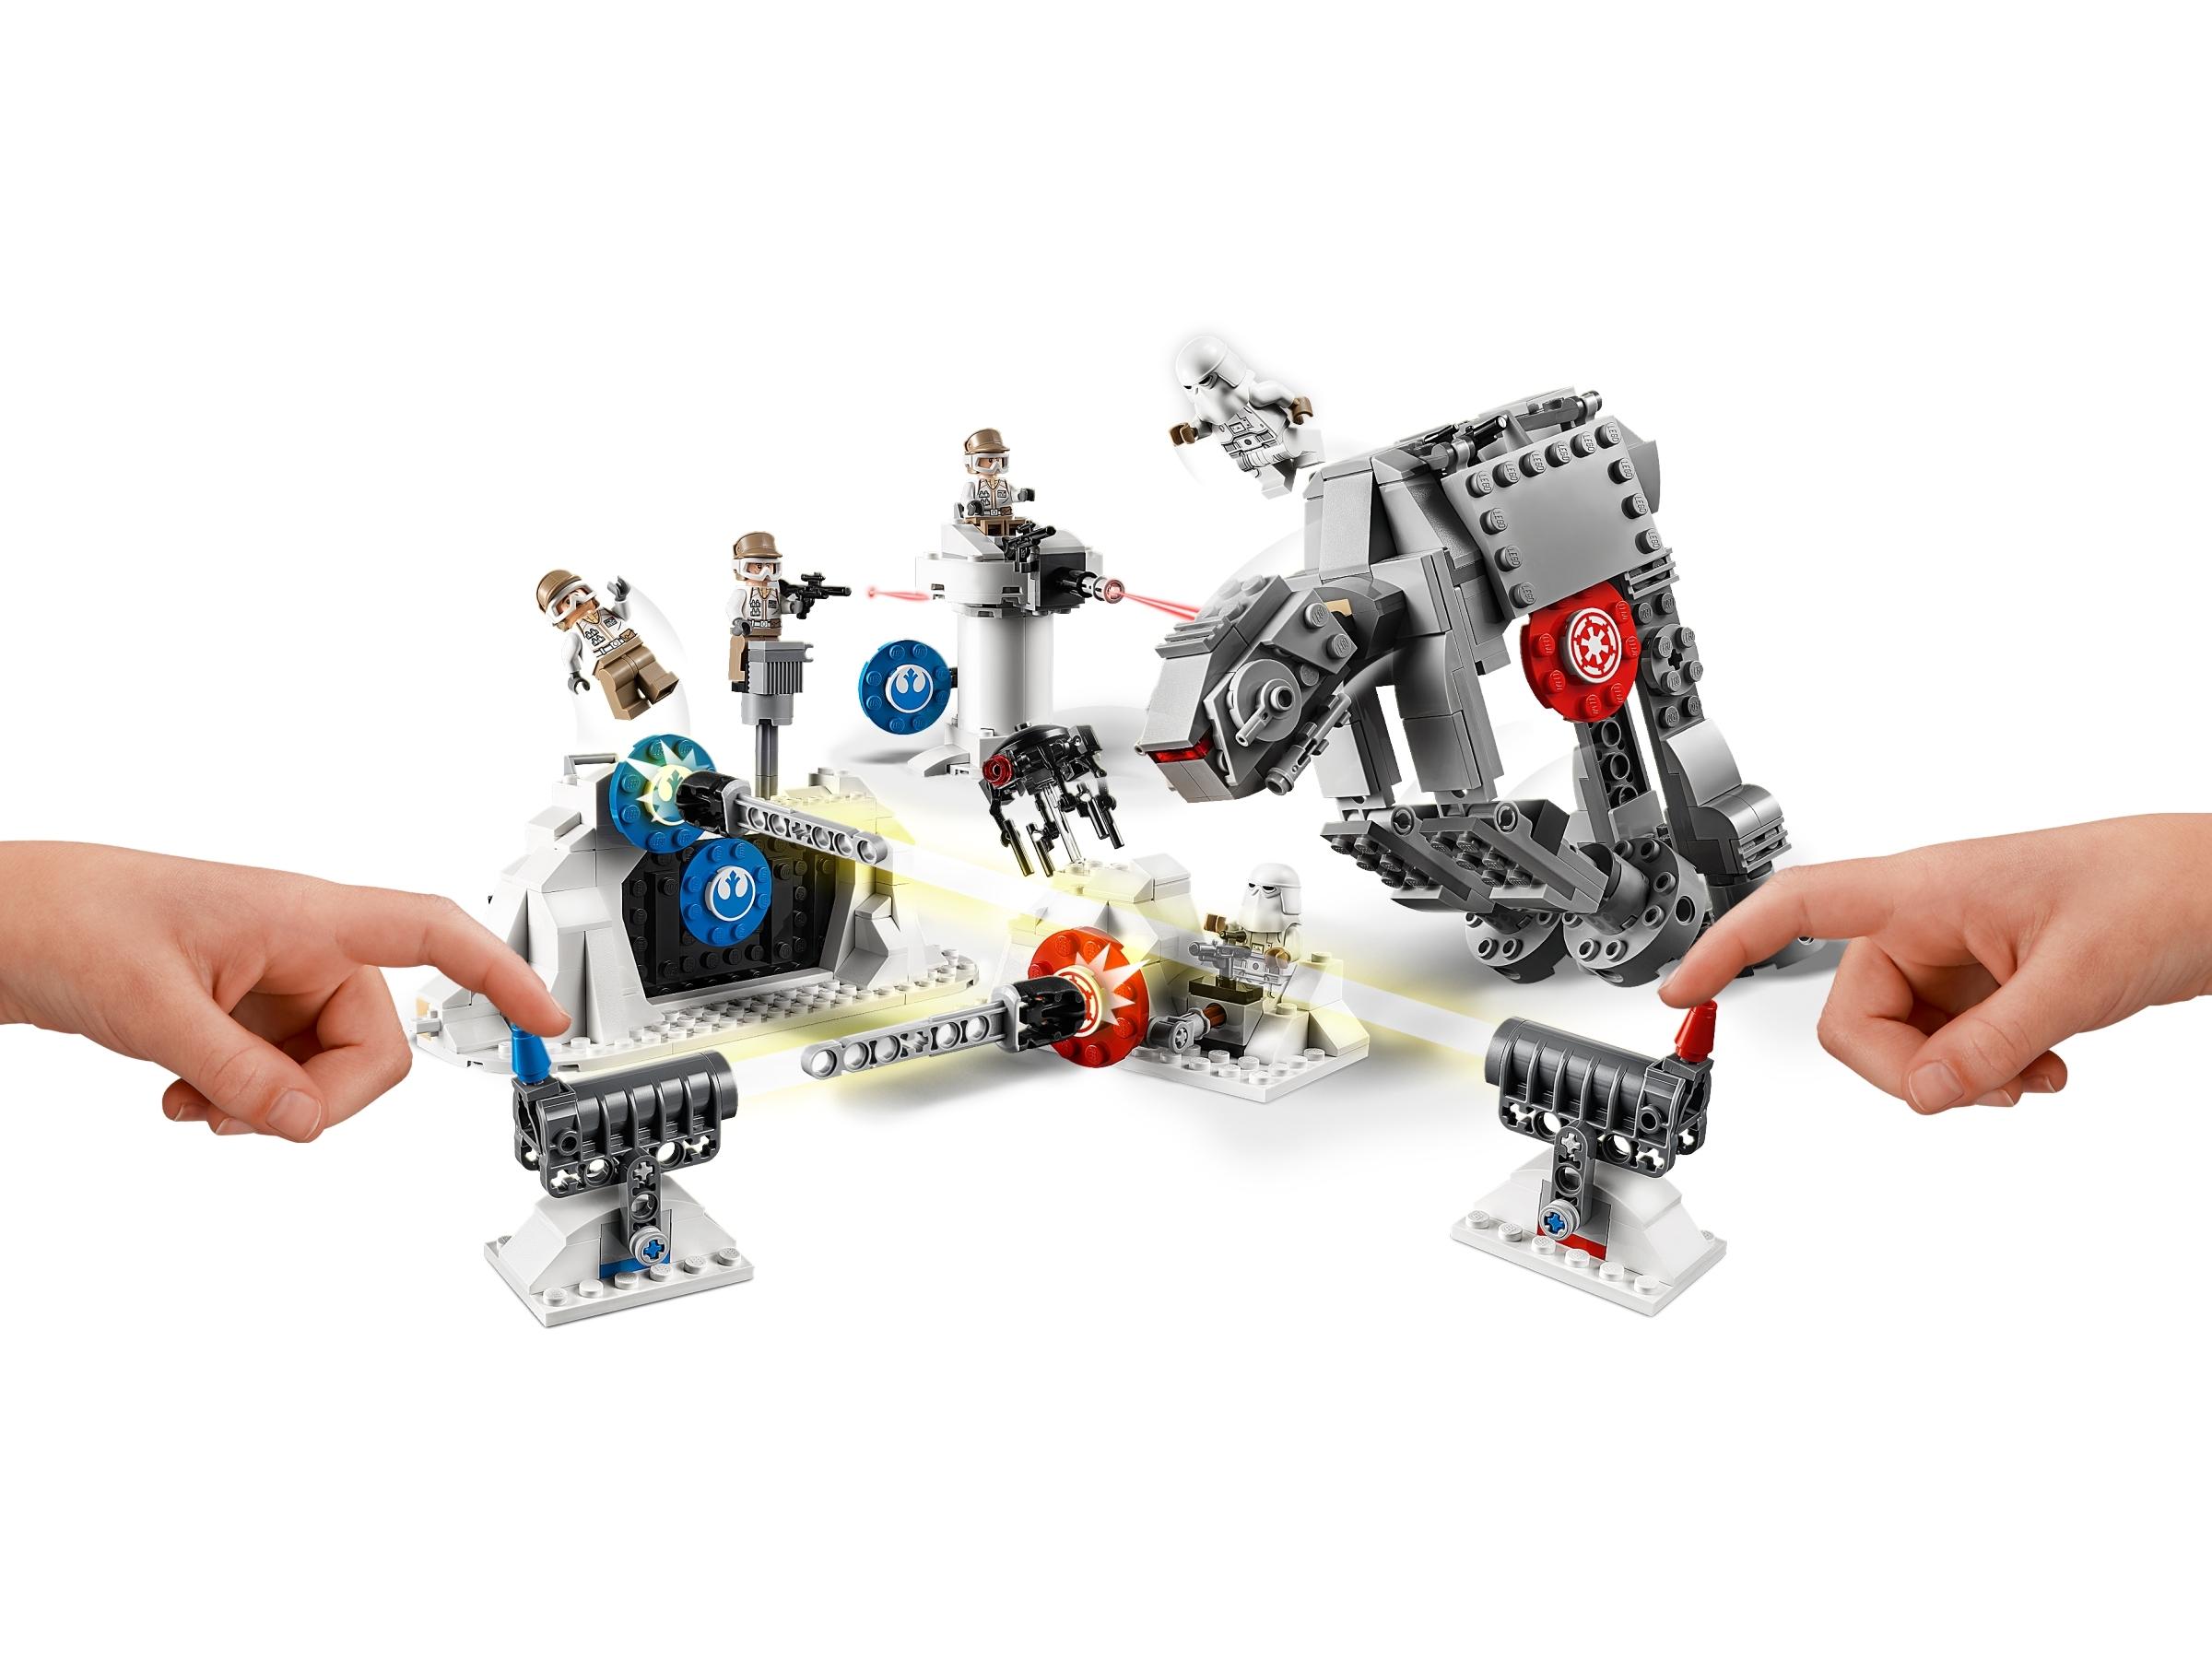 Lego Star Wars Lot of 3 Snowtrooper Minifigure 75241 75239